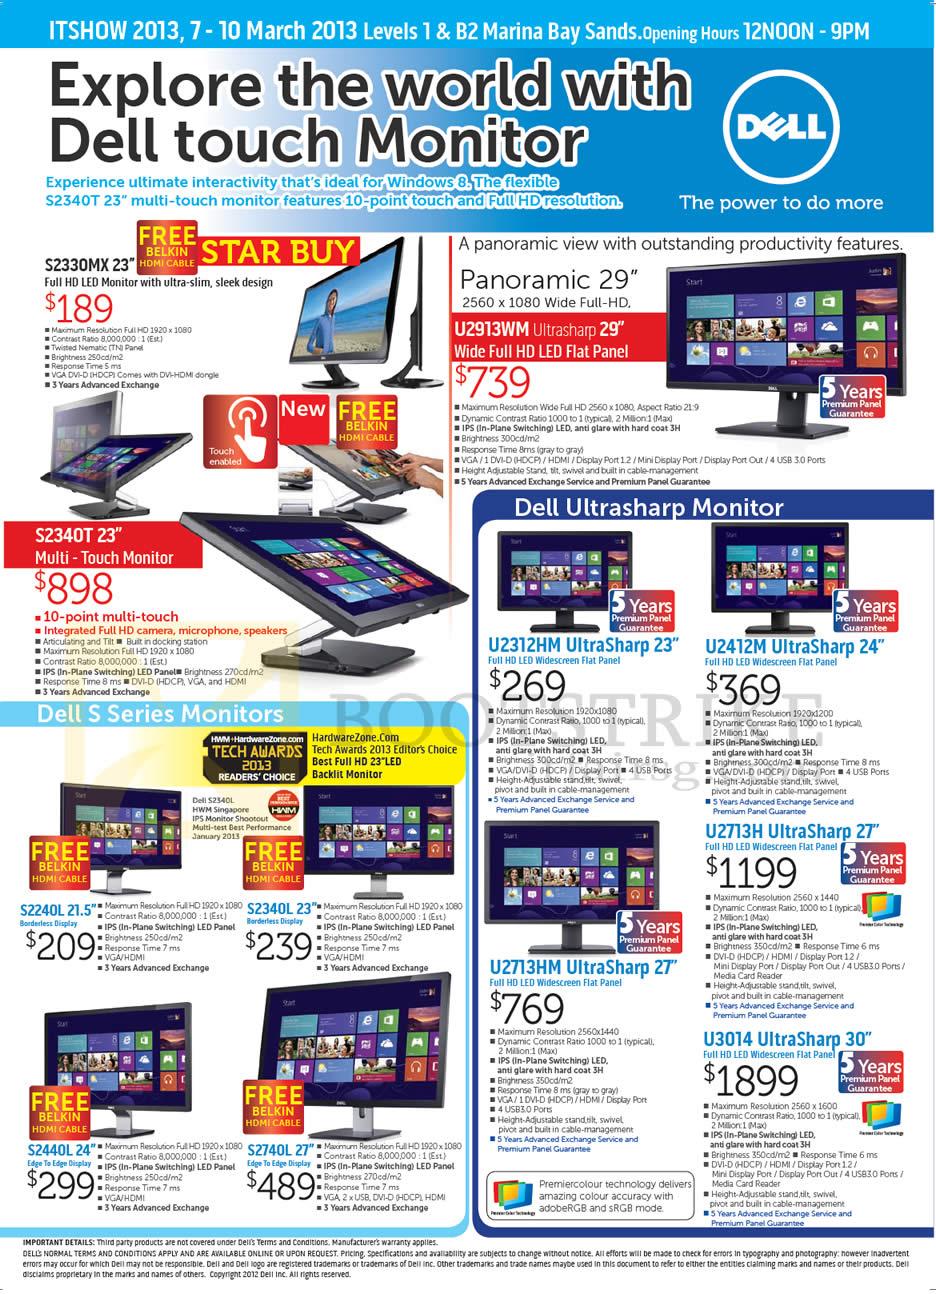 IT SHOW 2013 price list image brochure of Dell Monitors LED S2330MX 23, S2340T, U2913WM, S2240L, S2340L, S2440L, S2740L, U2312HM, U2412M, U2713H, U2713HM, U3014